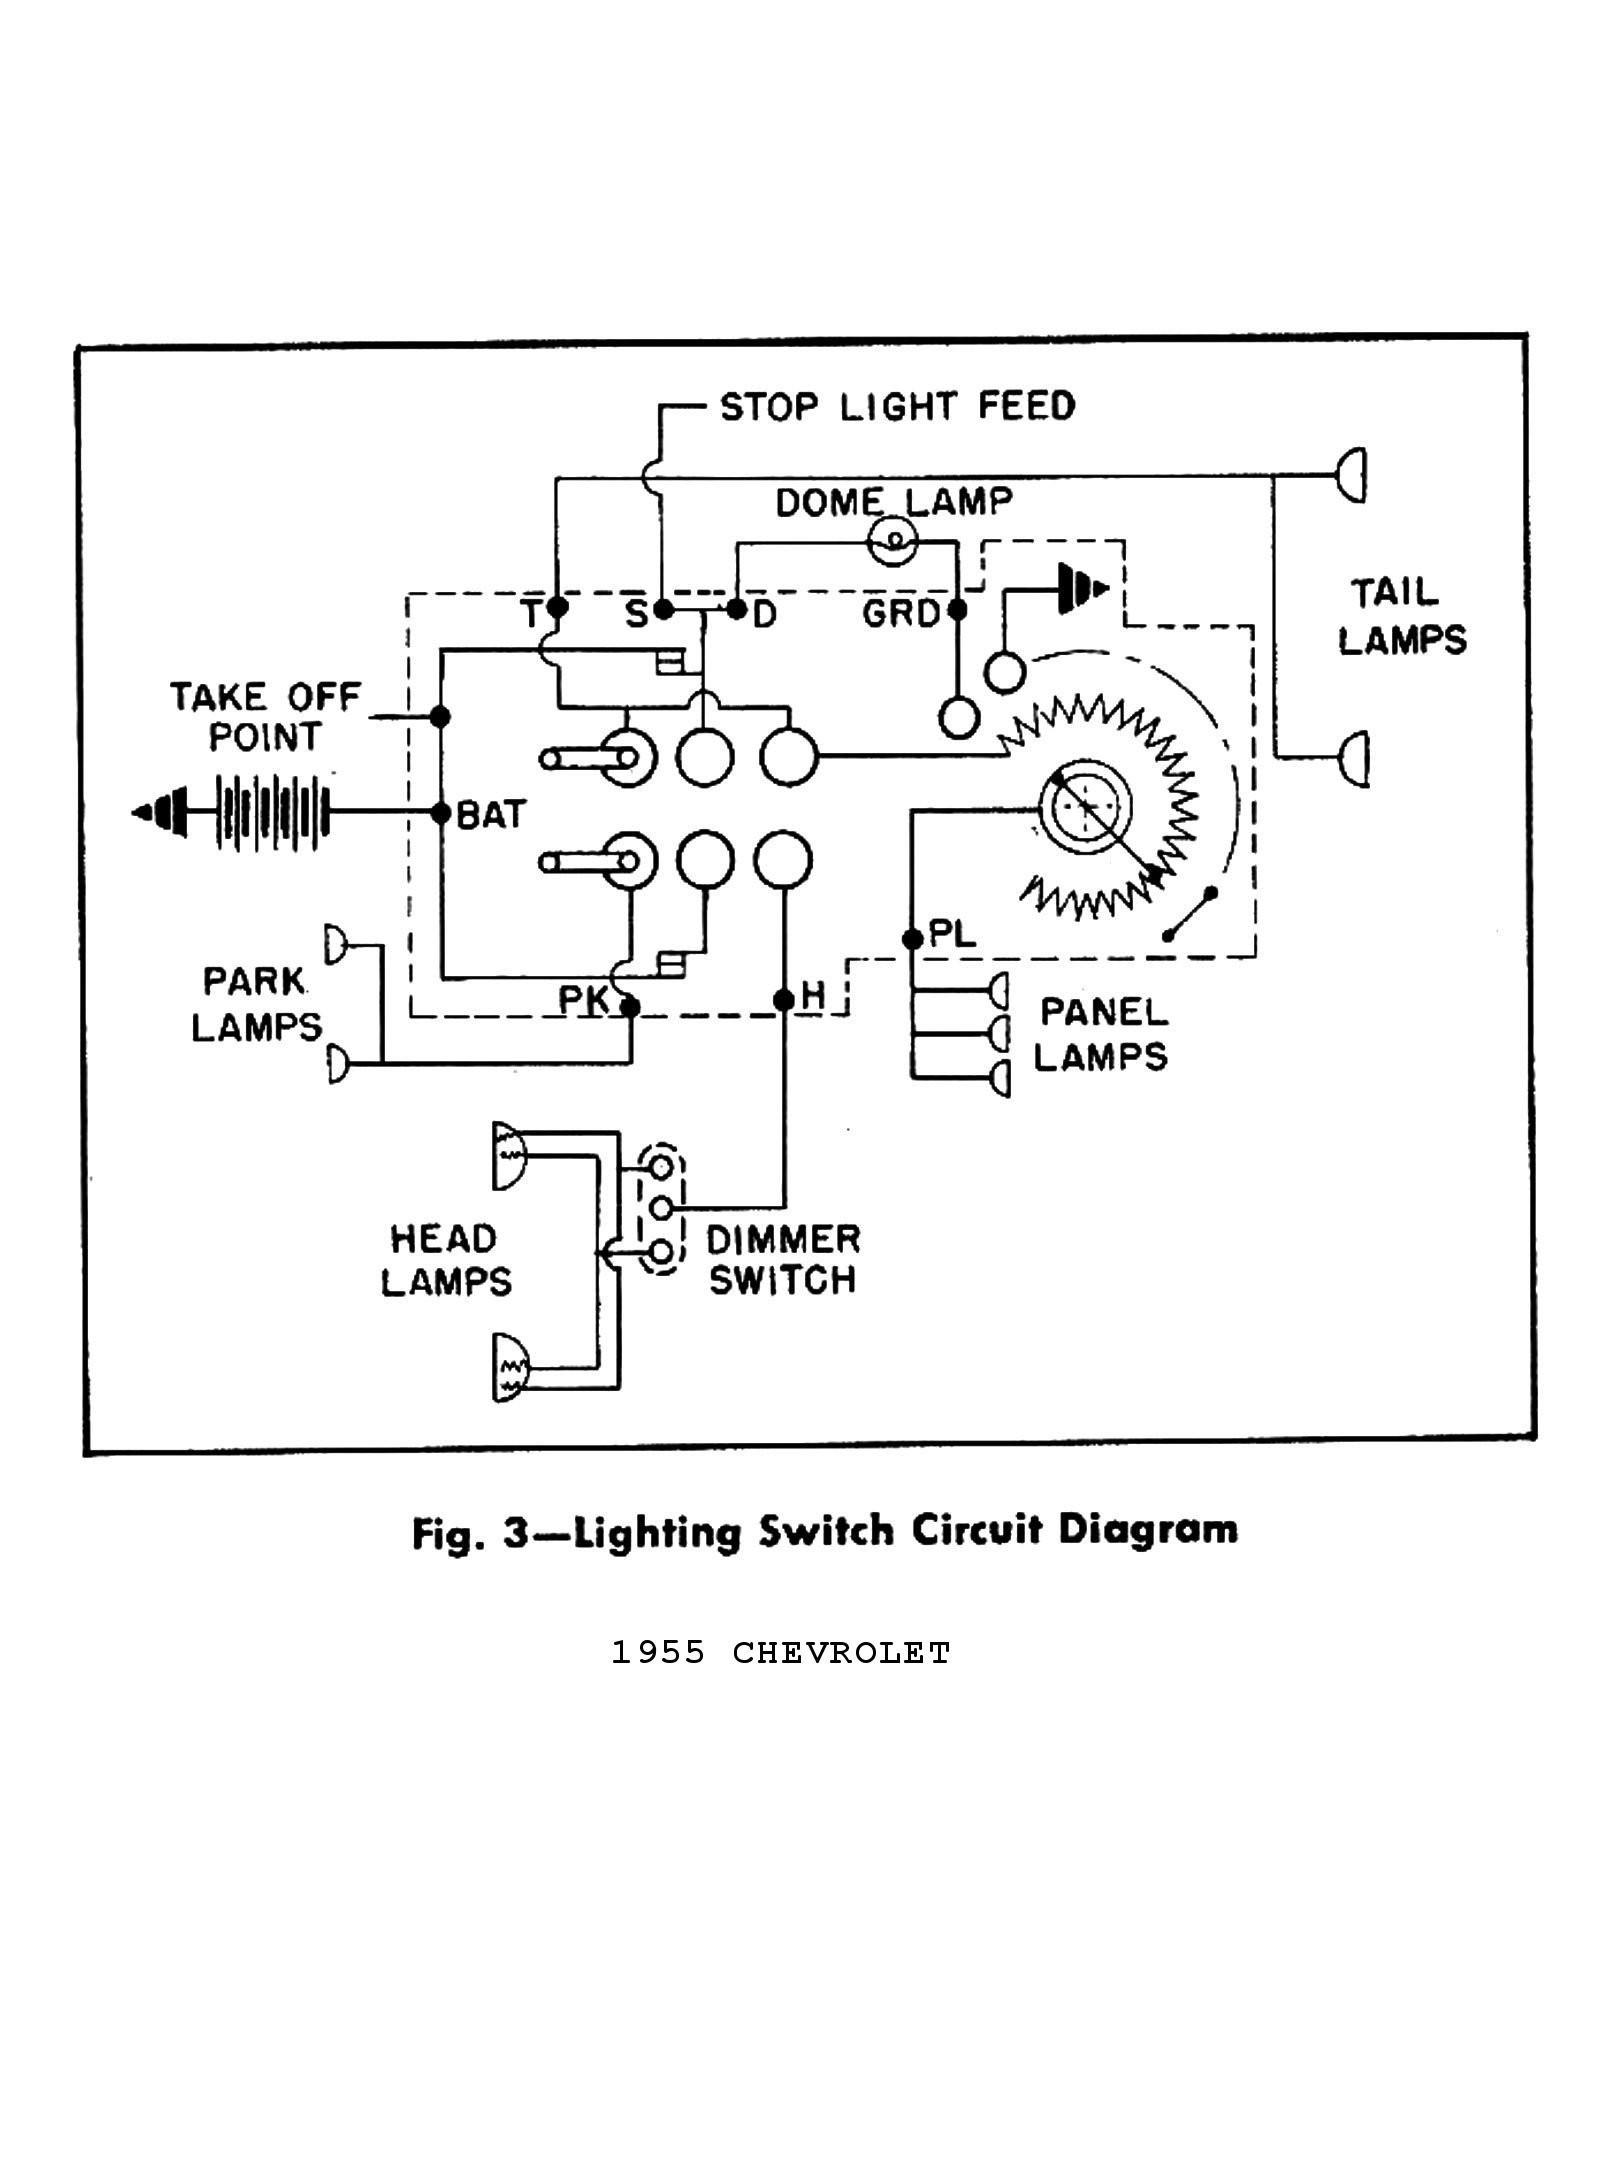 kti hydraulic pump wiring diagram book of gm headlight switch wiring rh citruscyclecenter 1970 gm headlight switch wiring diagram 1985 GM Headlight